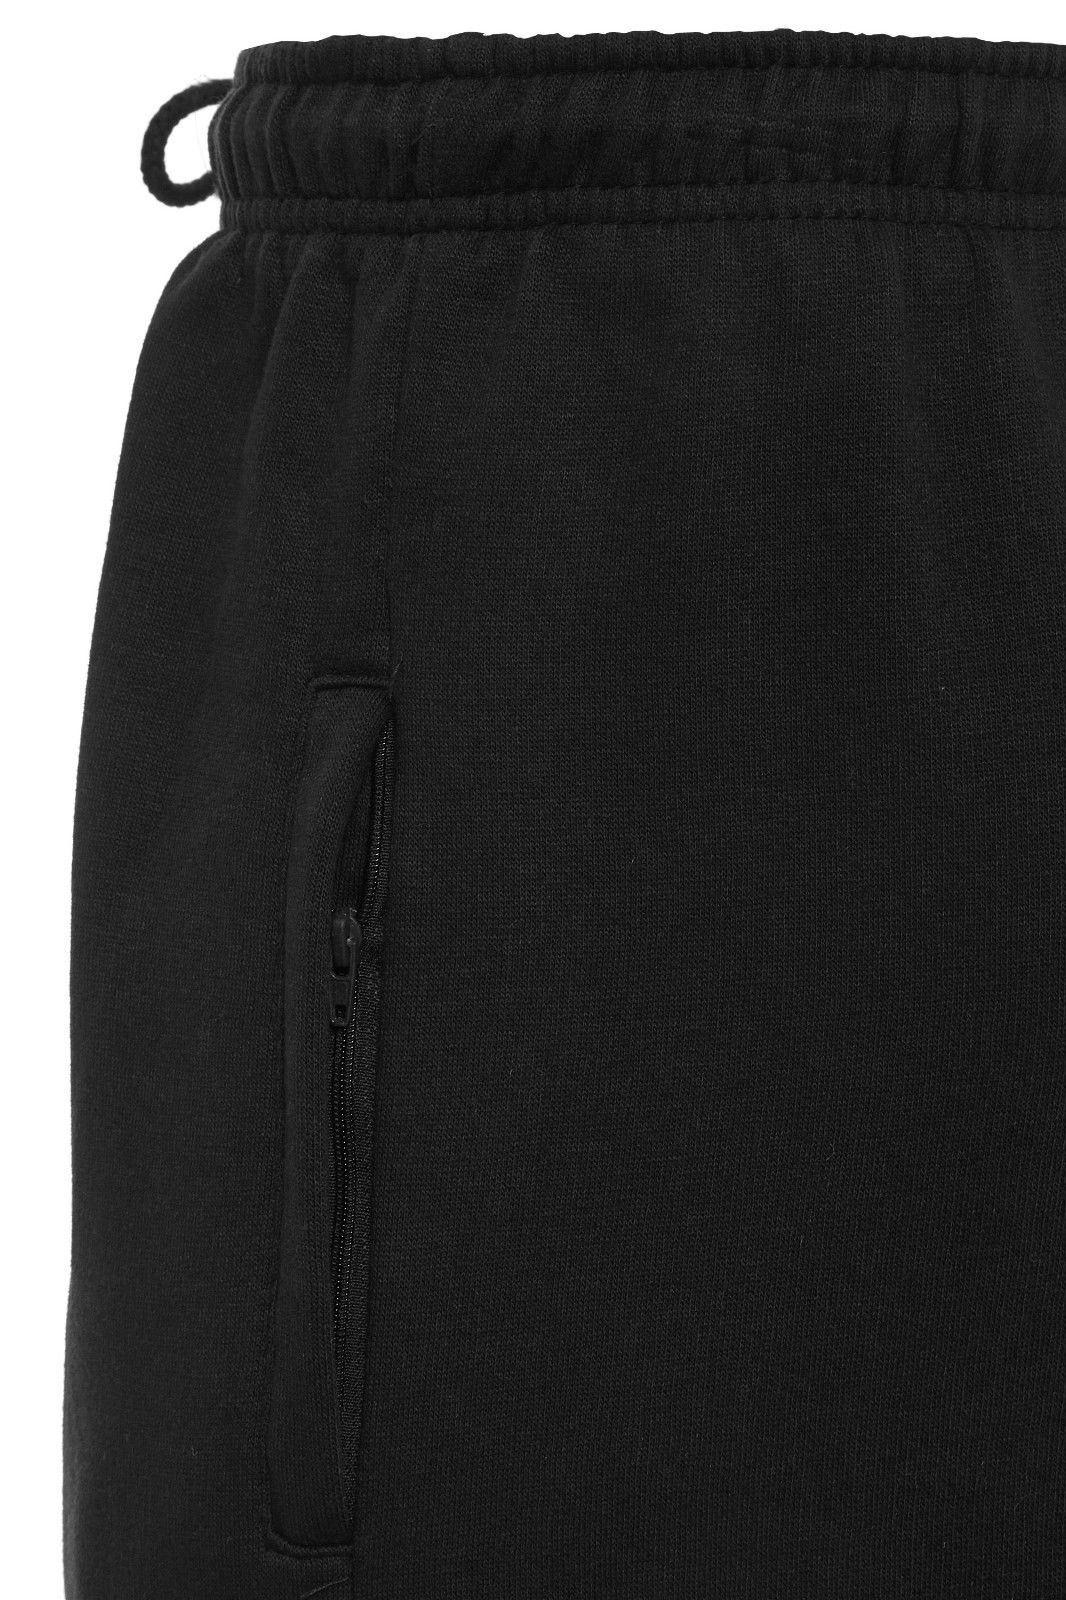 Uomo-Casual-Tinta-Unita-Pantaloni-sportivi-Bottoms-Apri-Hem-Sudore-Pantaloni-Tasche-Con-Zip miniatura 4